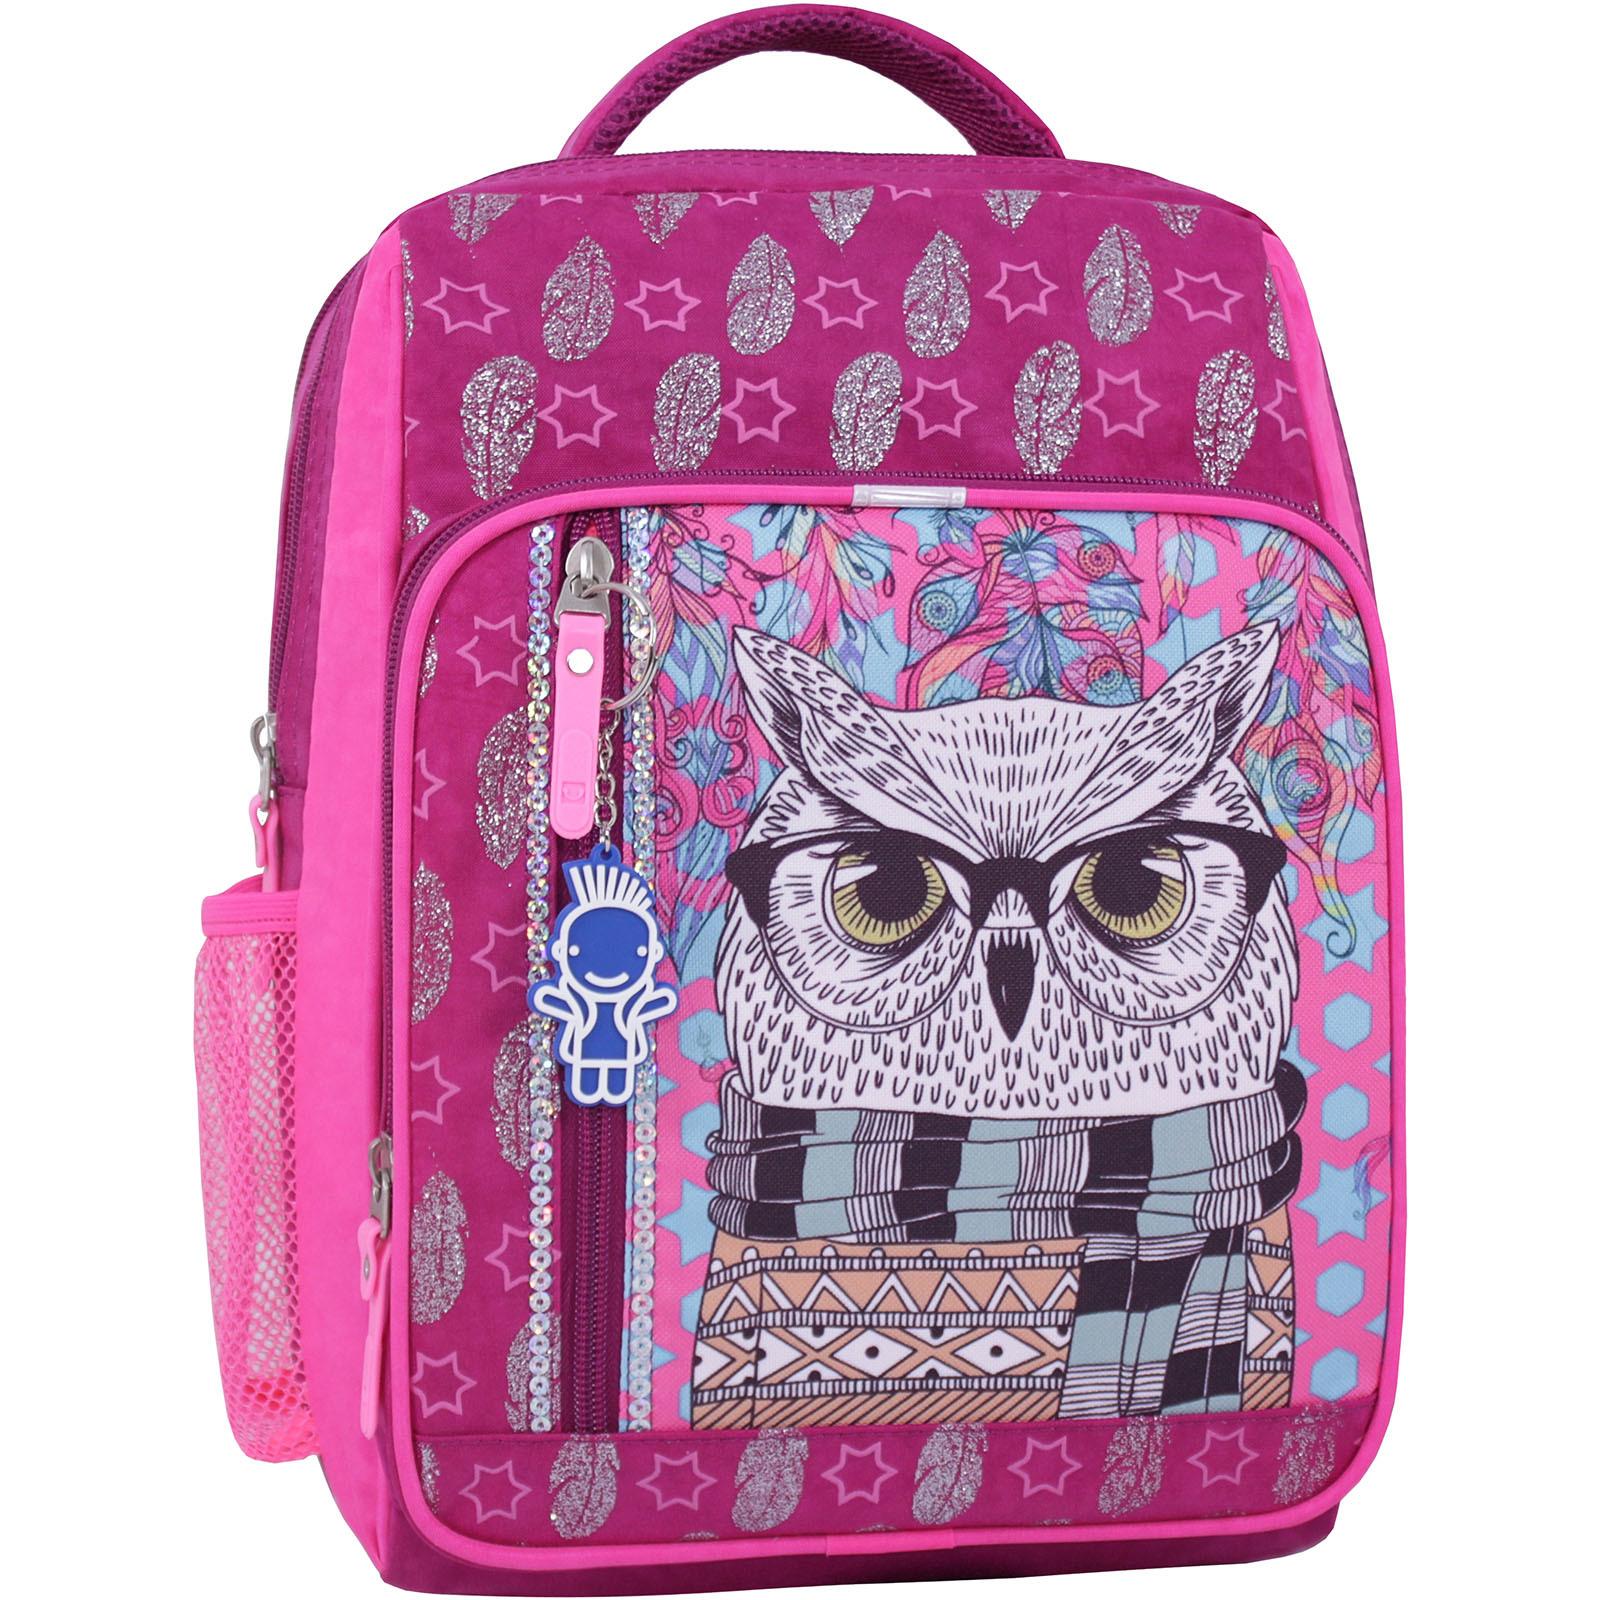 Школьные рюкзаки Рюкзак школьный Bagland Школьник 8 л. 143 малина 514 (00112702) IMG_1615_суб.514_.JPG